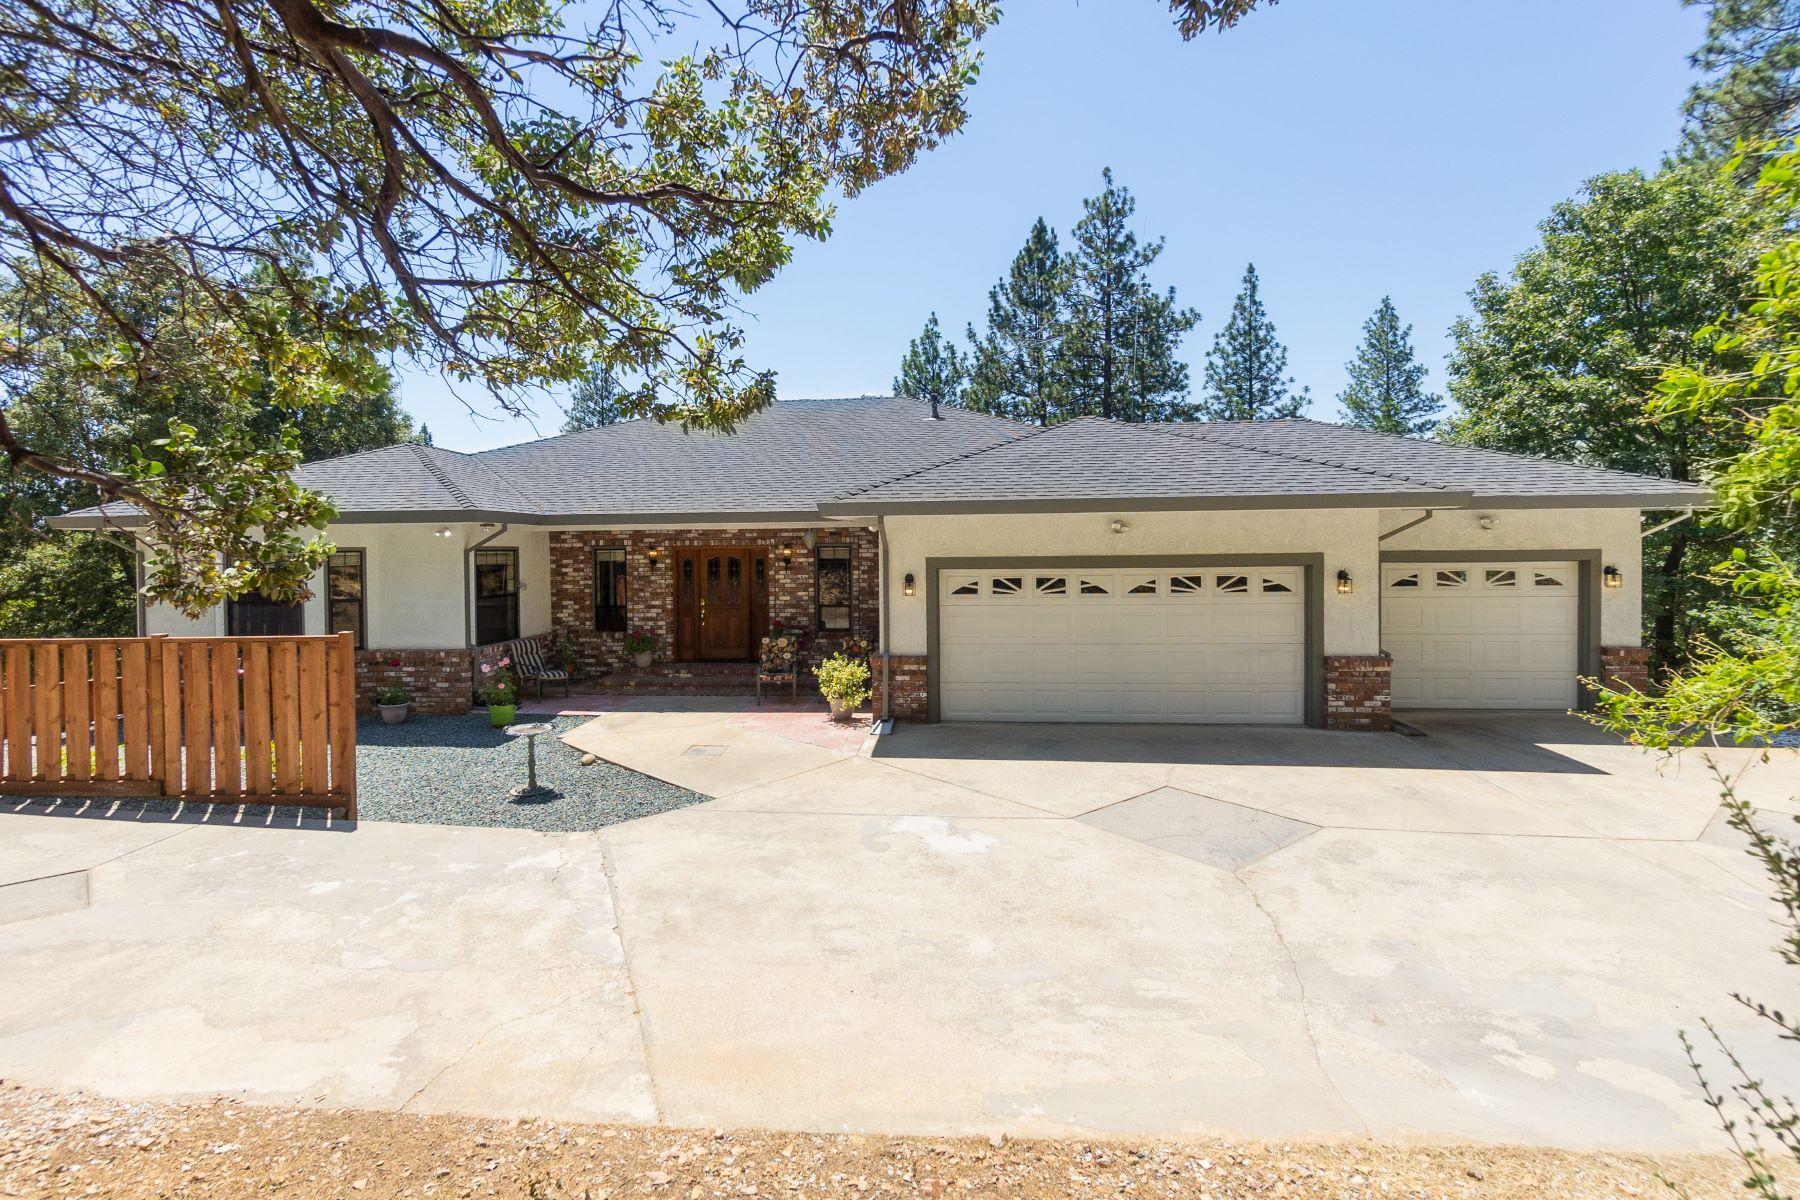 واحد منزل الأسرة للـ Sale في 21735 Homestead Road Pine Grove, California 95665 United States